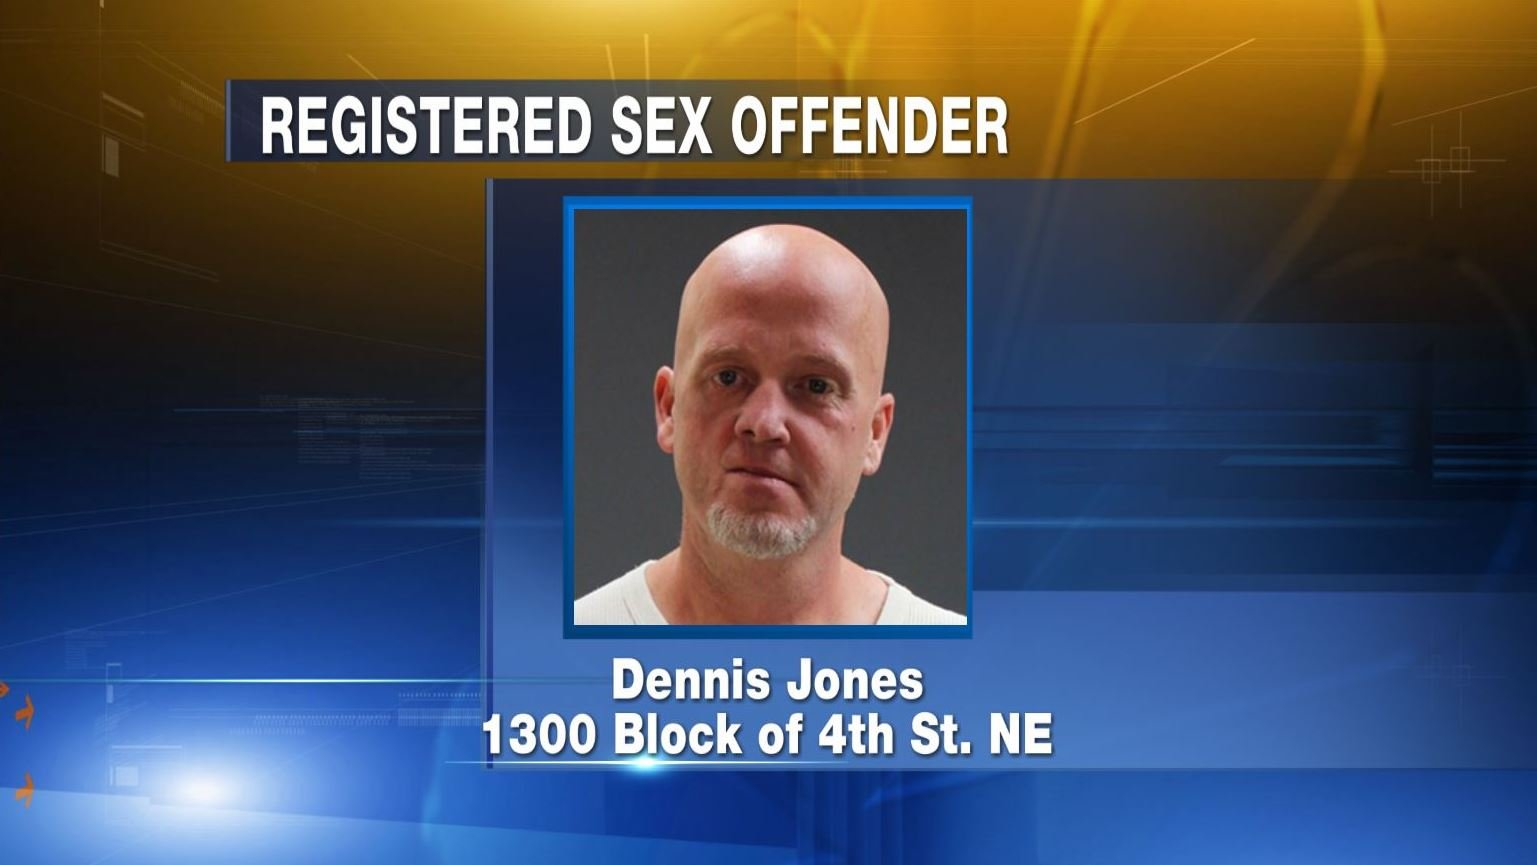 Registered leve 3 delincuente sexual